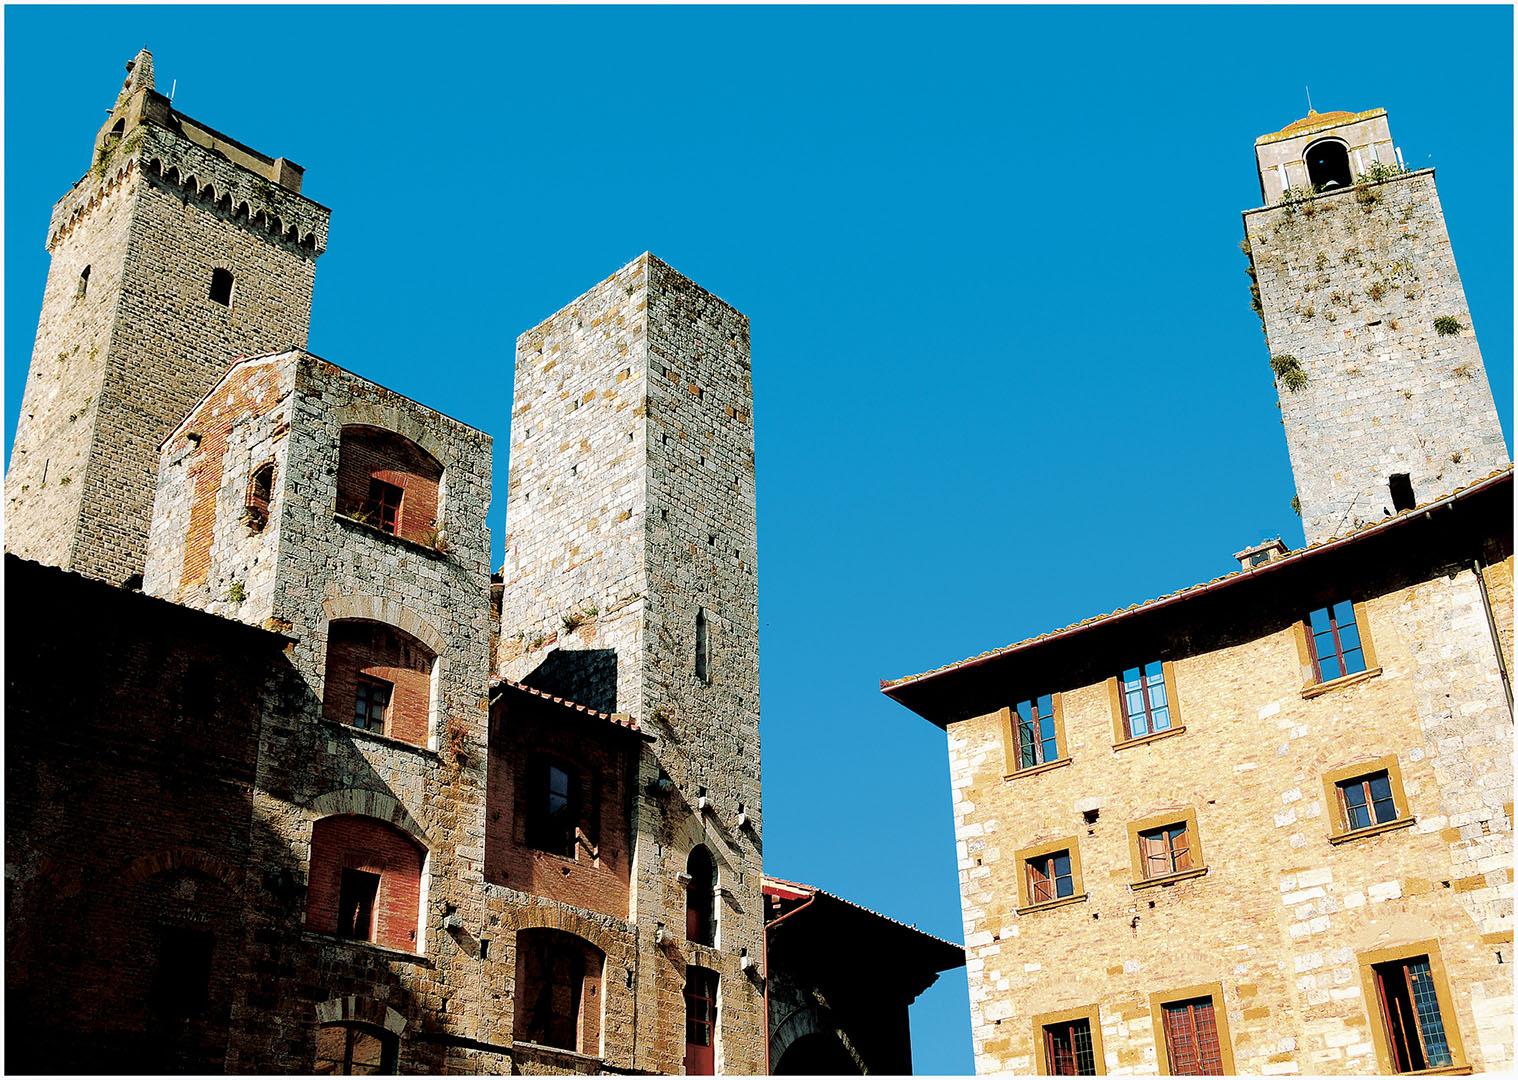 Toscana_035_I10.1-71